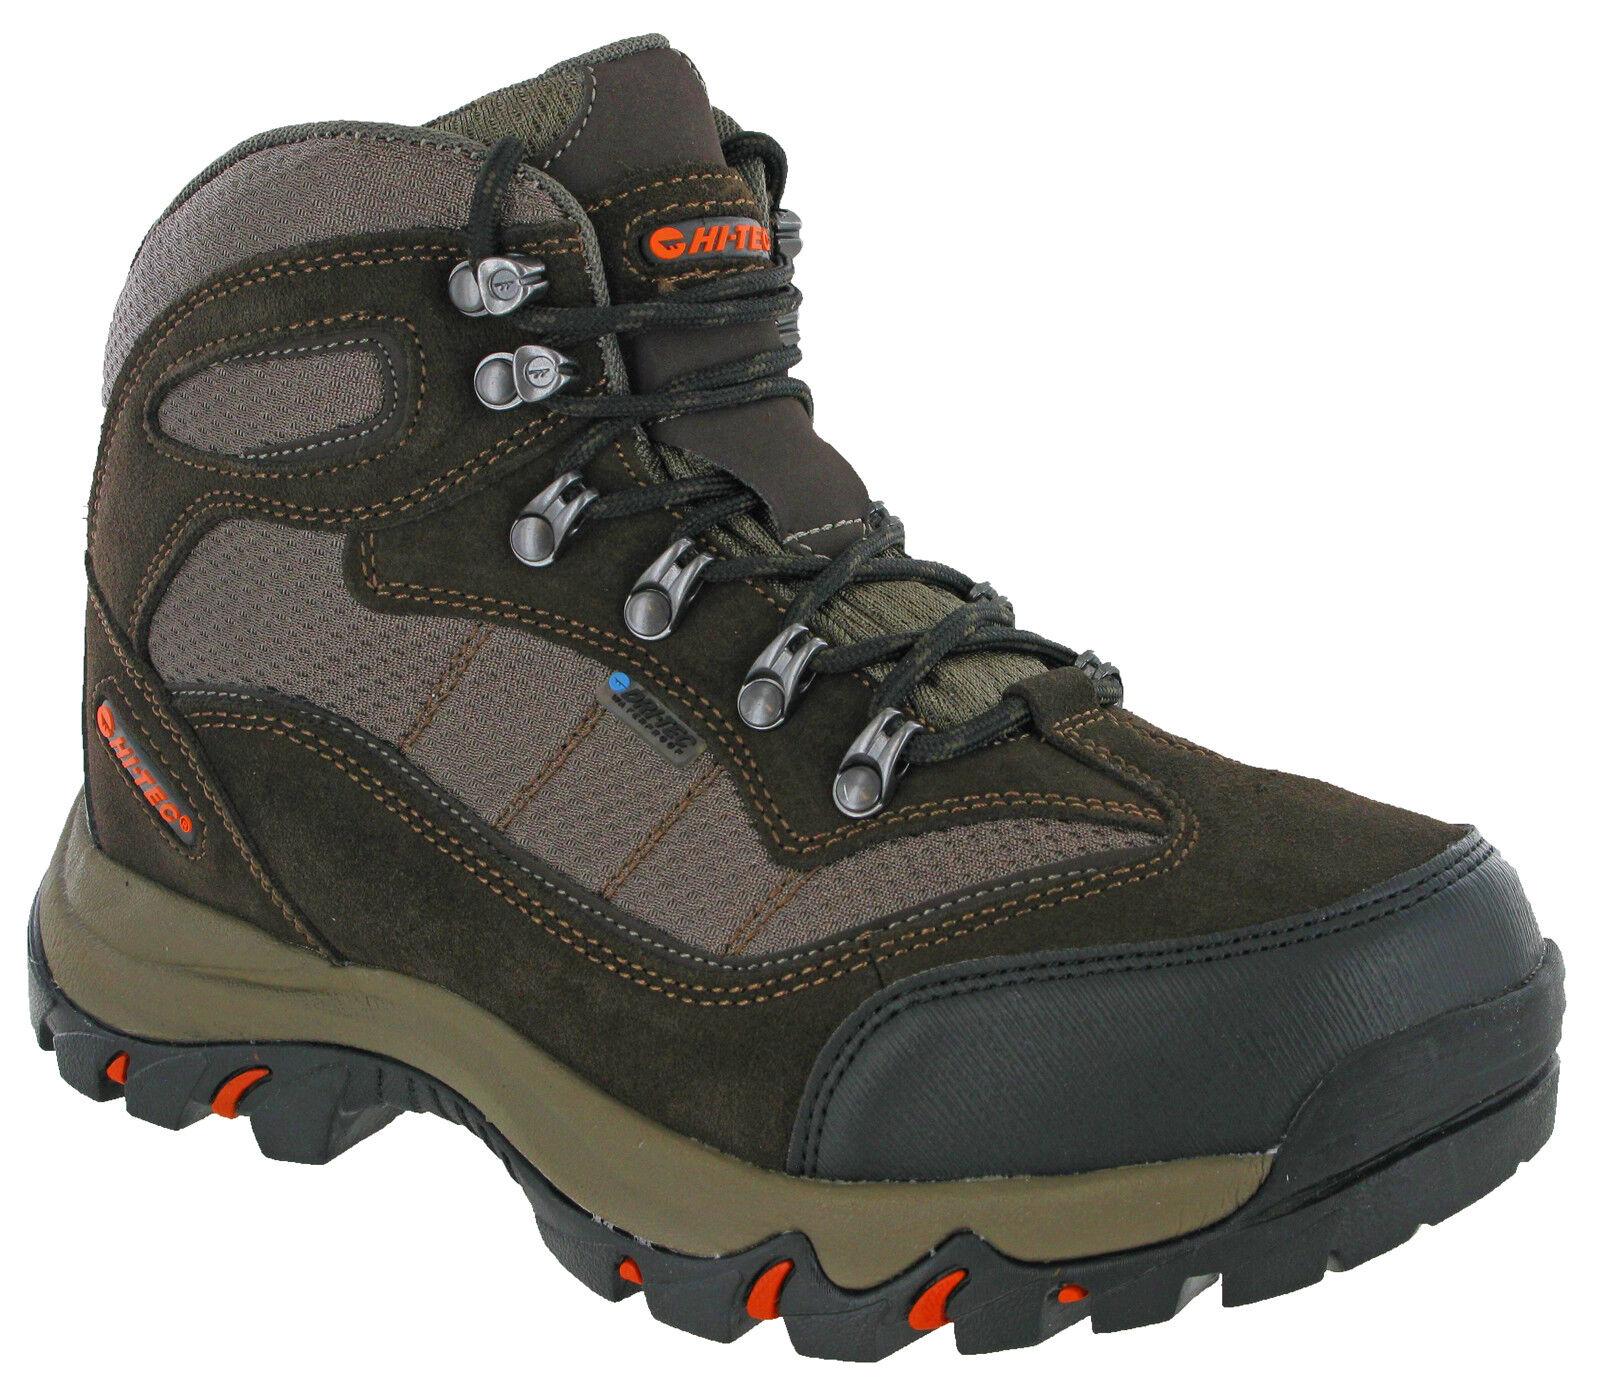 Hi-Tec Mens Walking Boots Waterproof Skamania Mesh Hiking Trail Lace   save 35% - 70% off